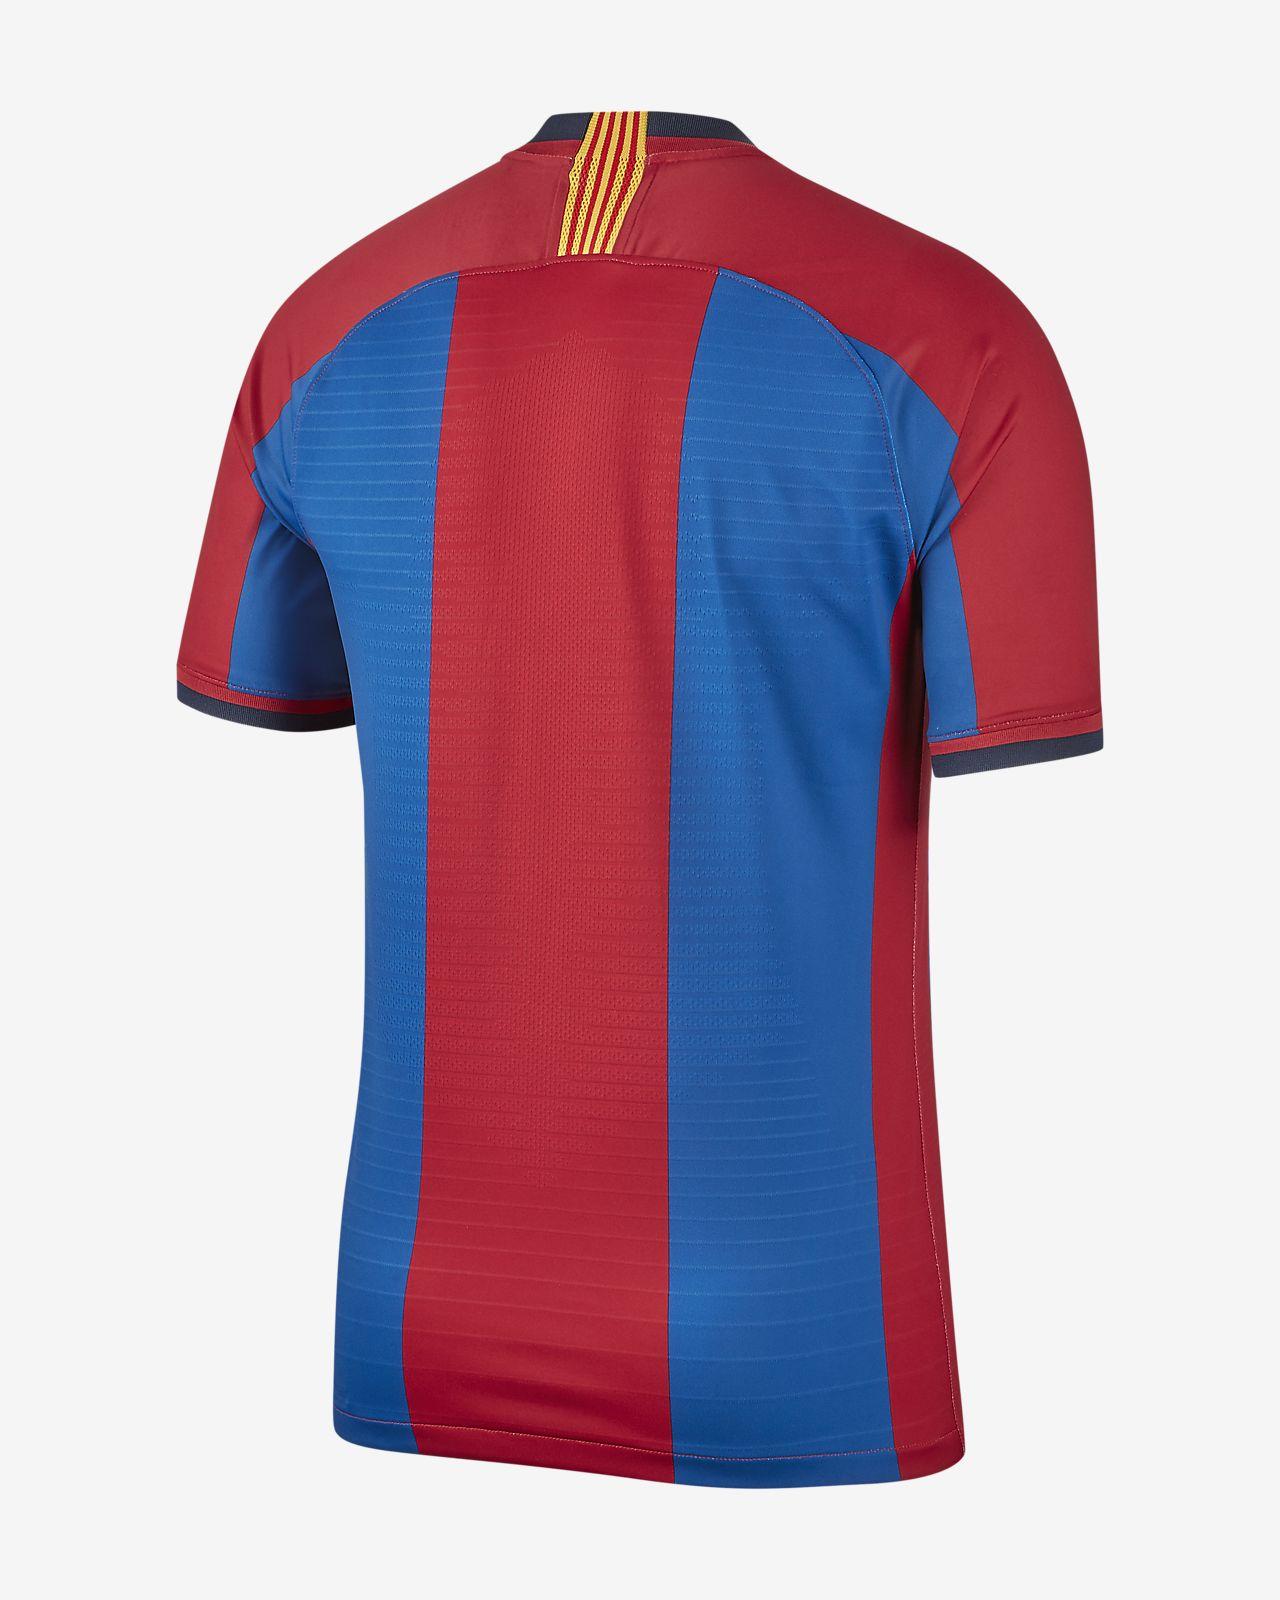 ea7b306c17a FC Barcelona Vapor Match '98/99 Men's Football Shirt. Nike.com GB